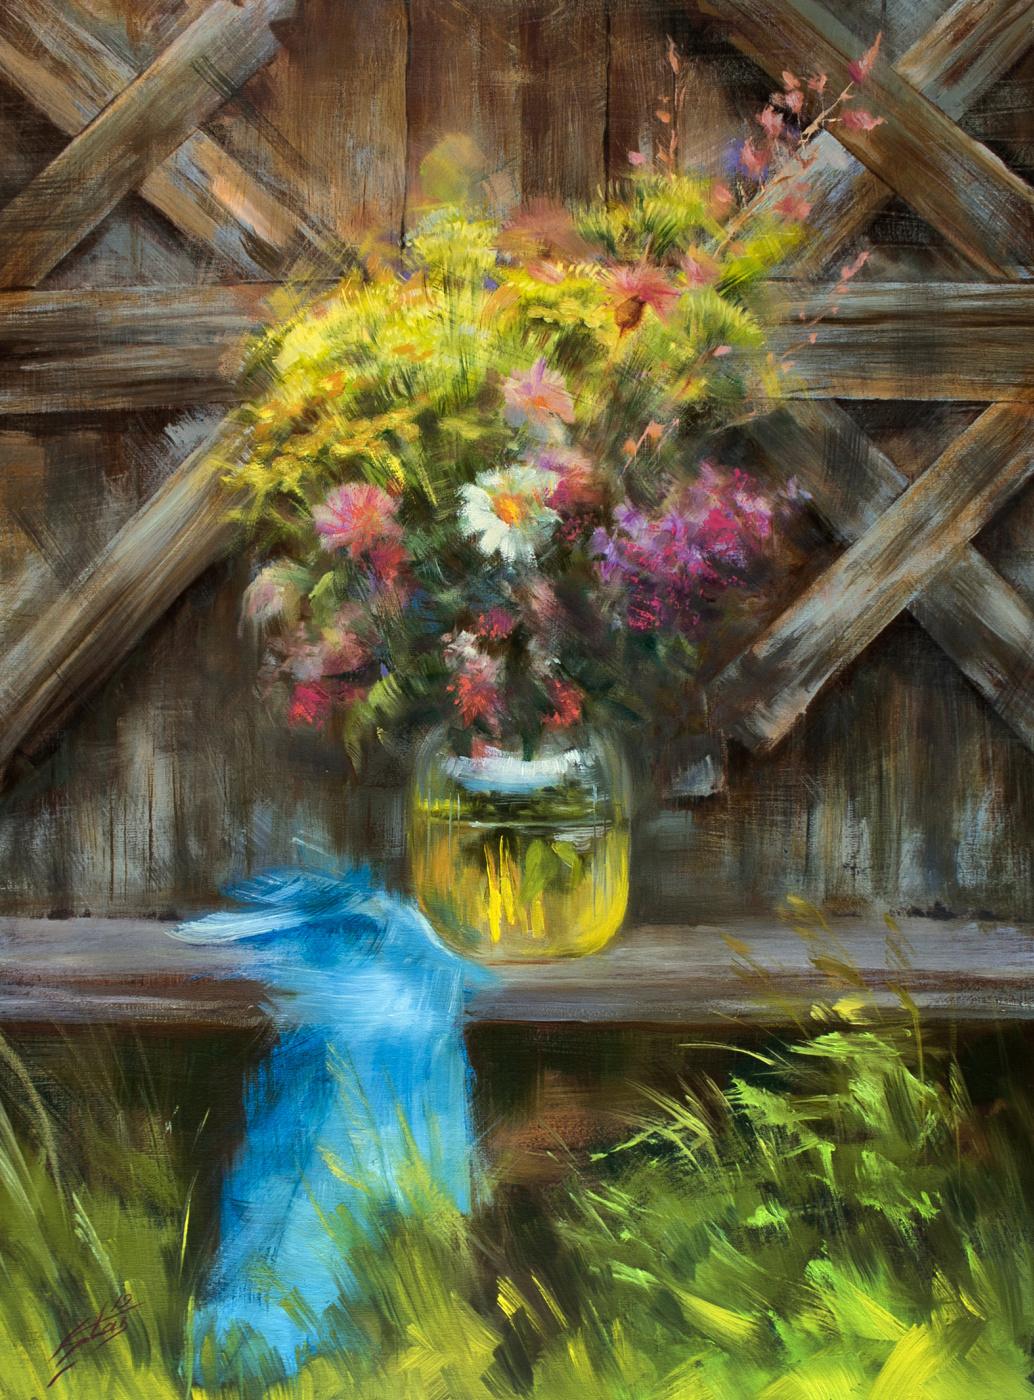 Valery Olegovich Starkov. Flowers at the gate